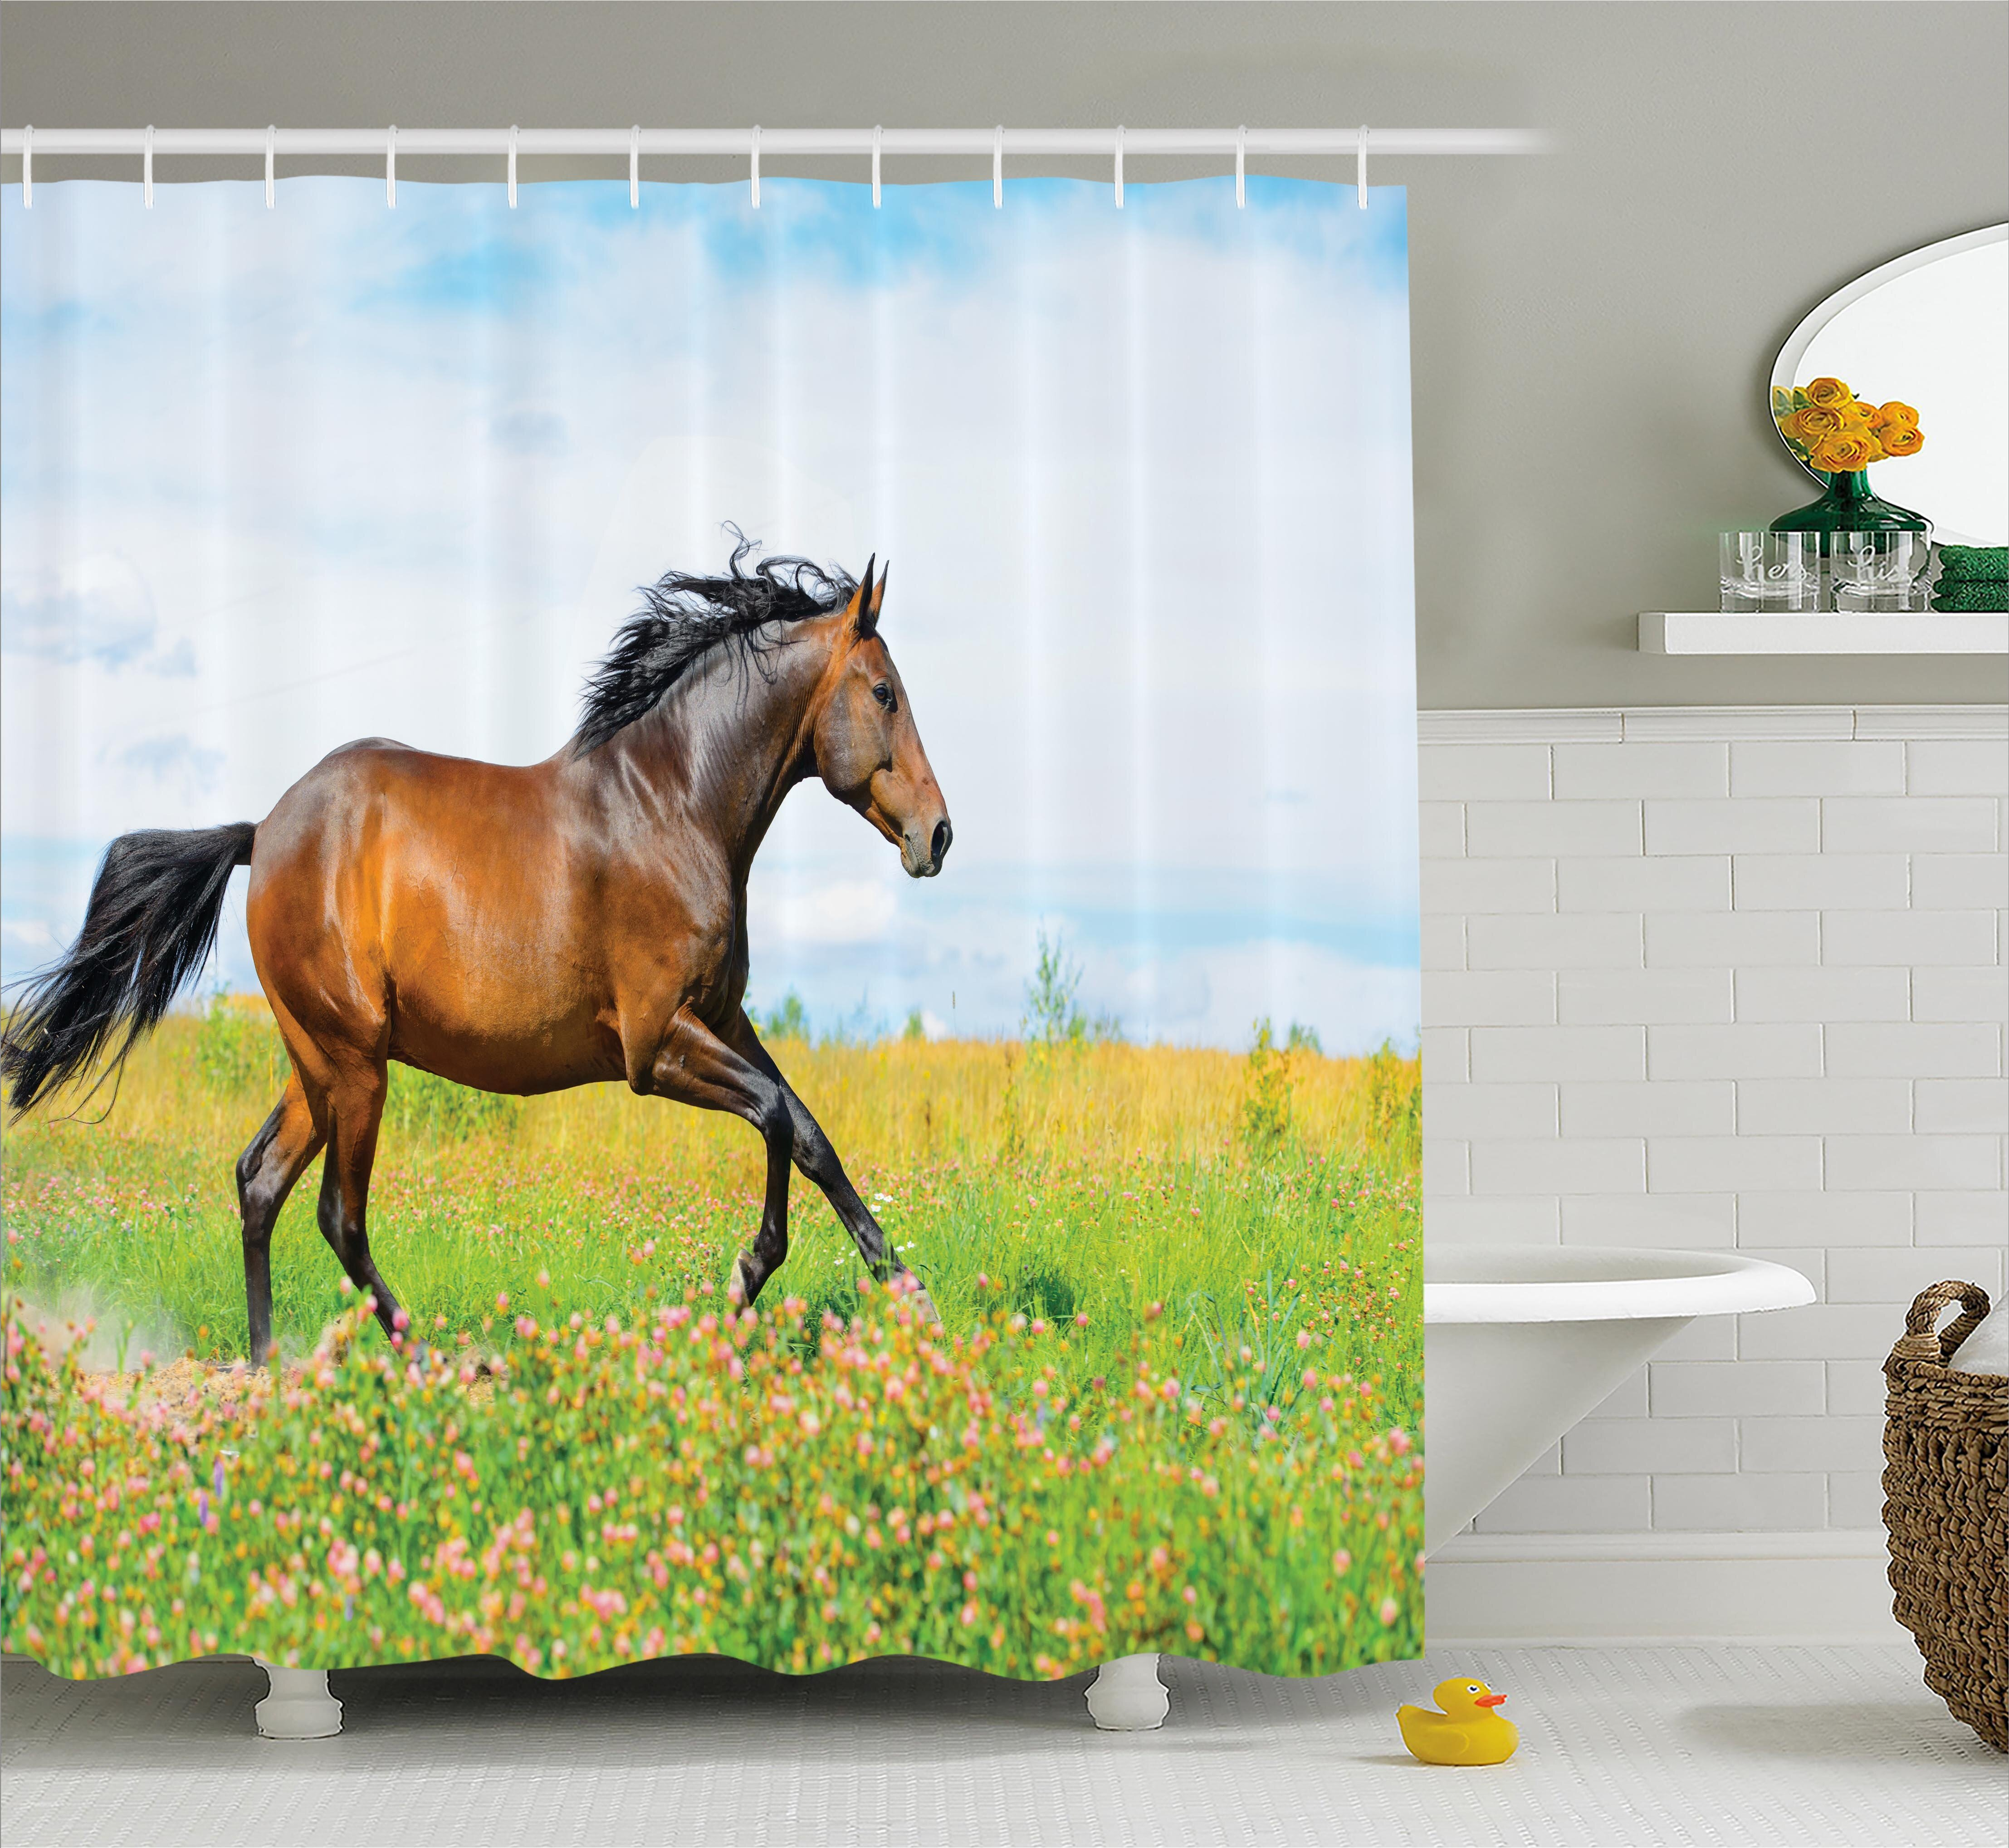 Ebern Designs Hamilton Horse Rural Flowers Shower Curtain